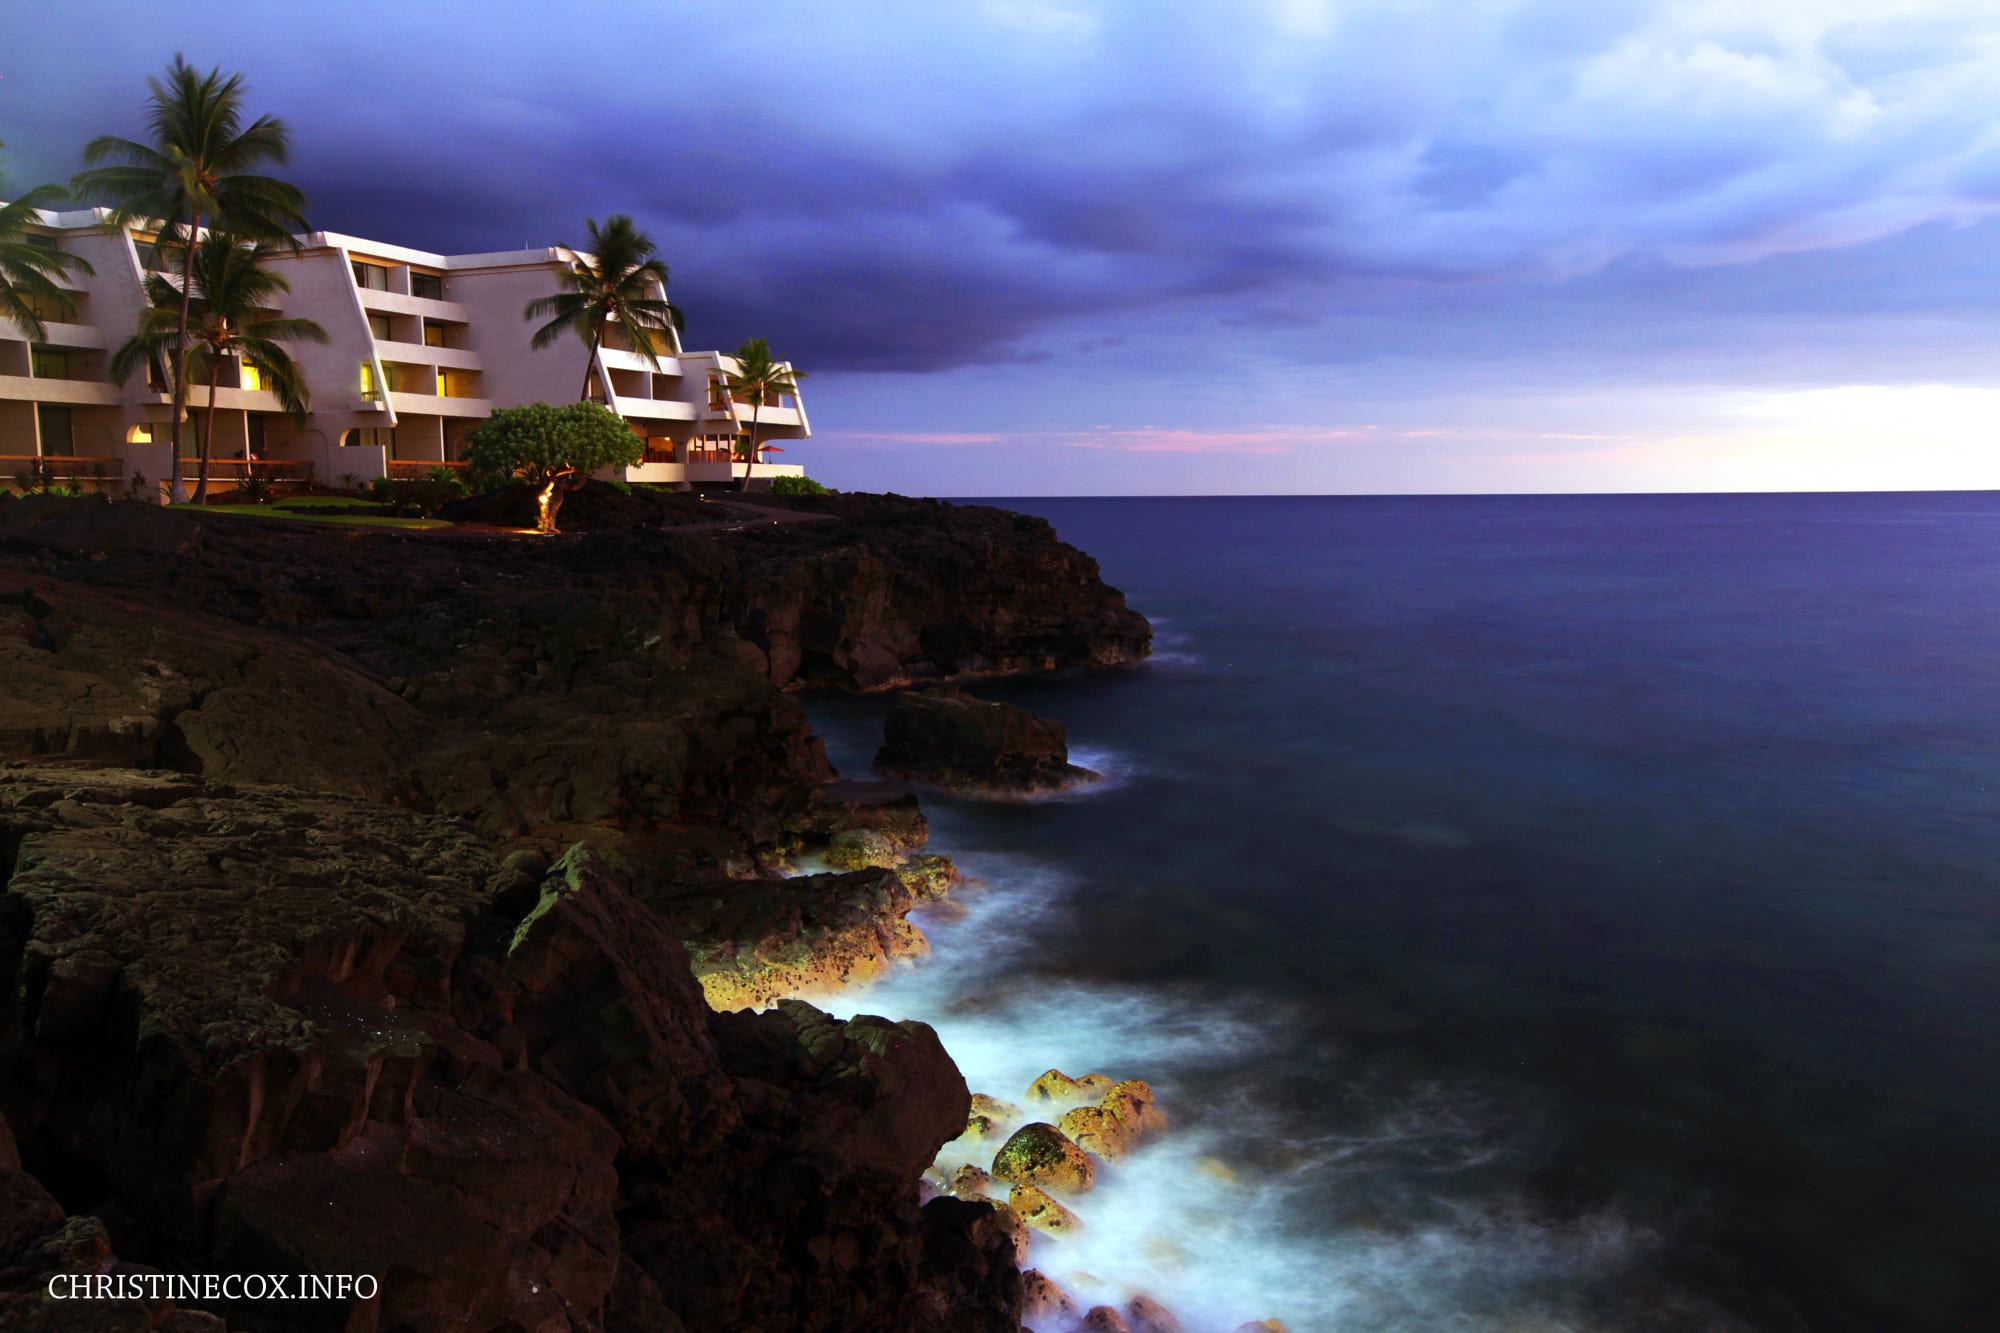 Paradise by Christine Cox - Photo 5462675 / 500px